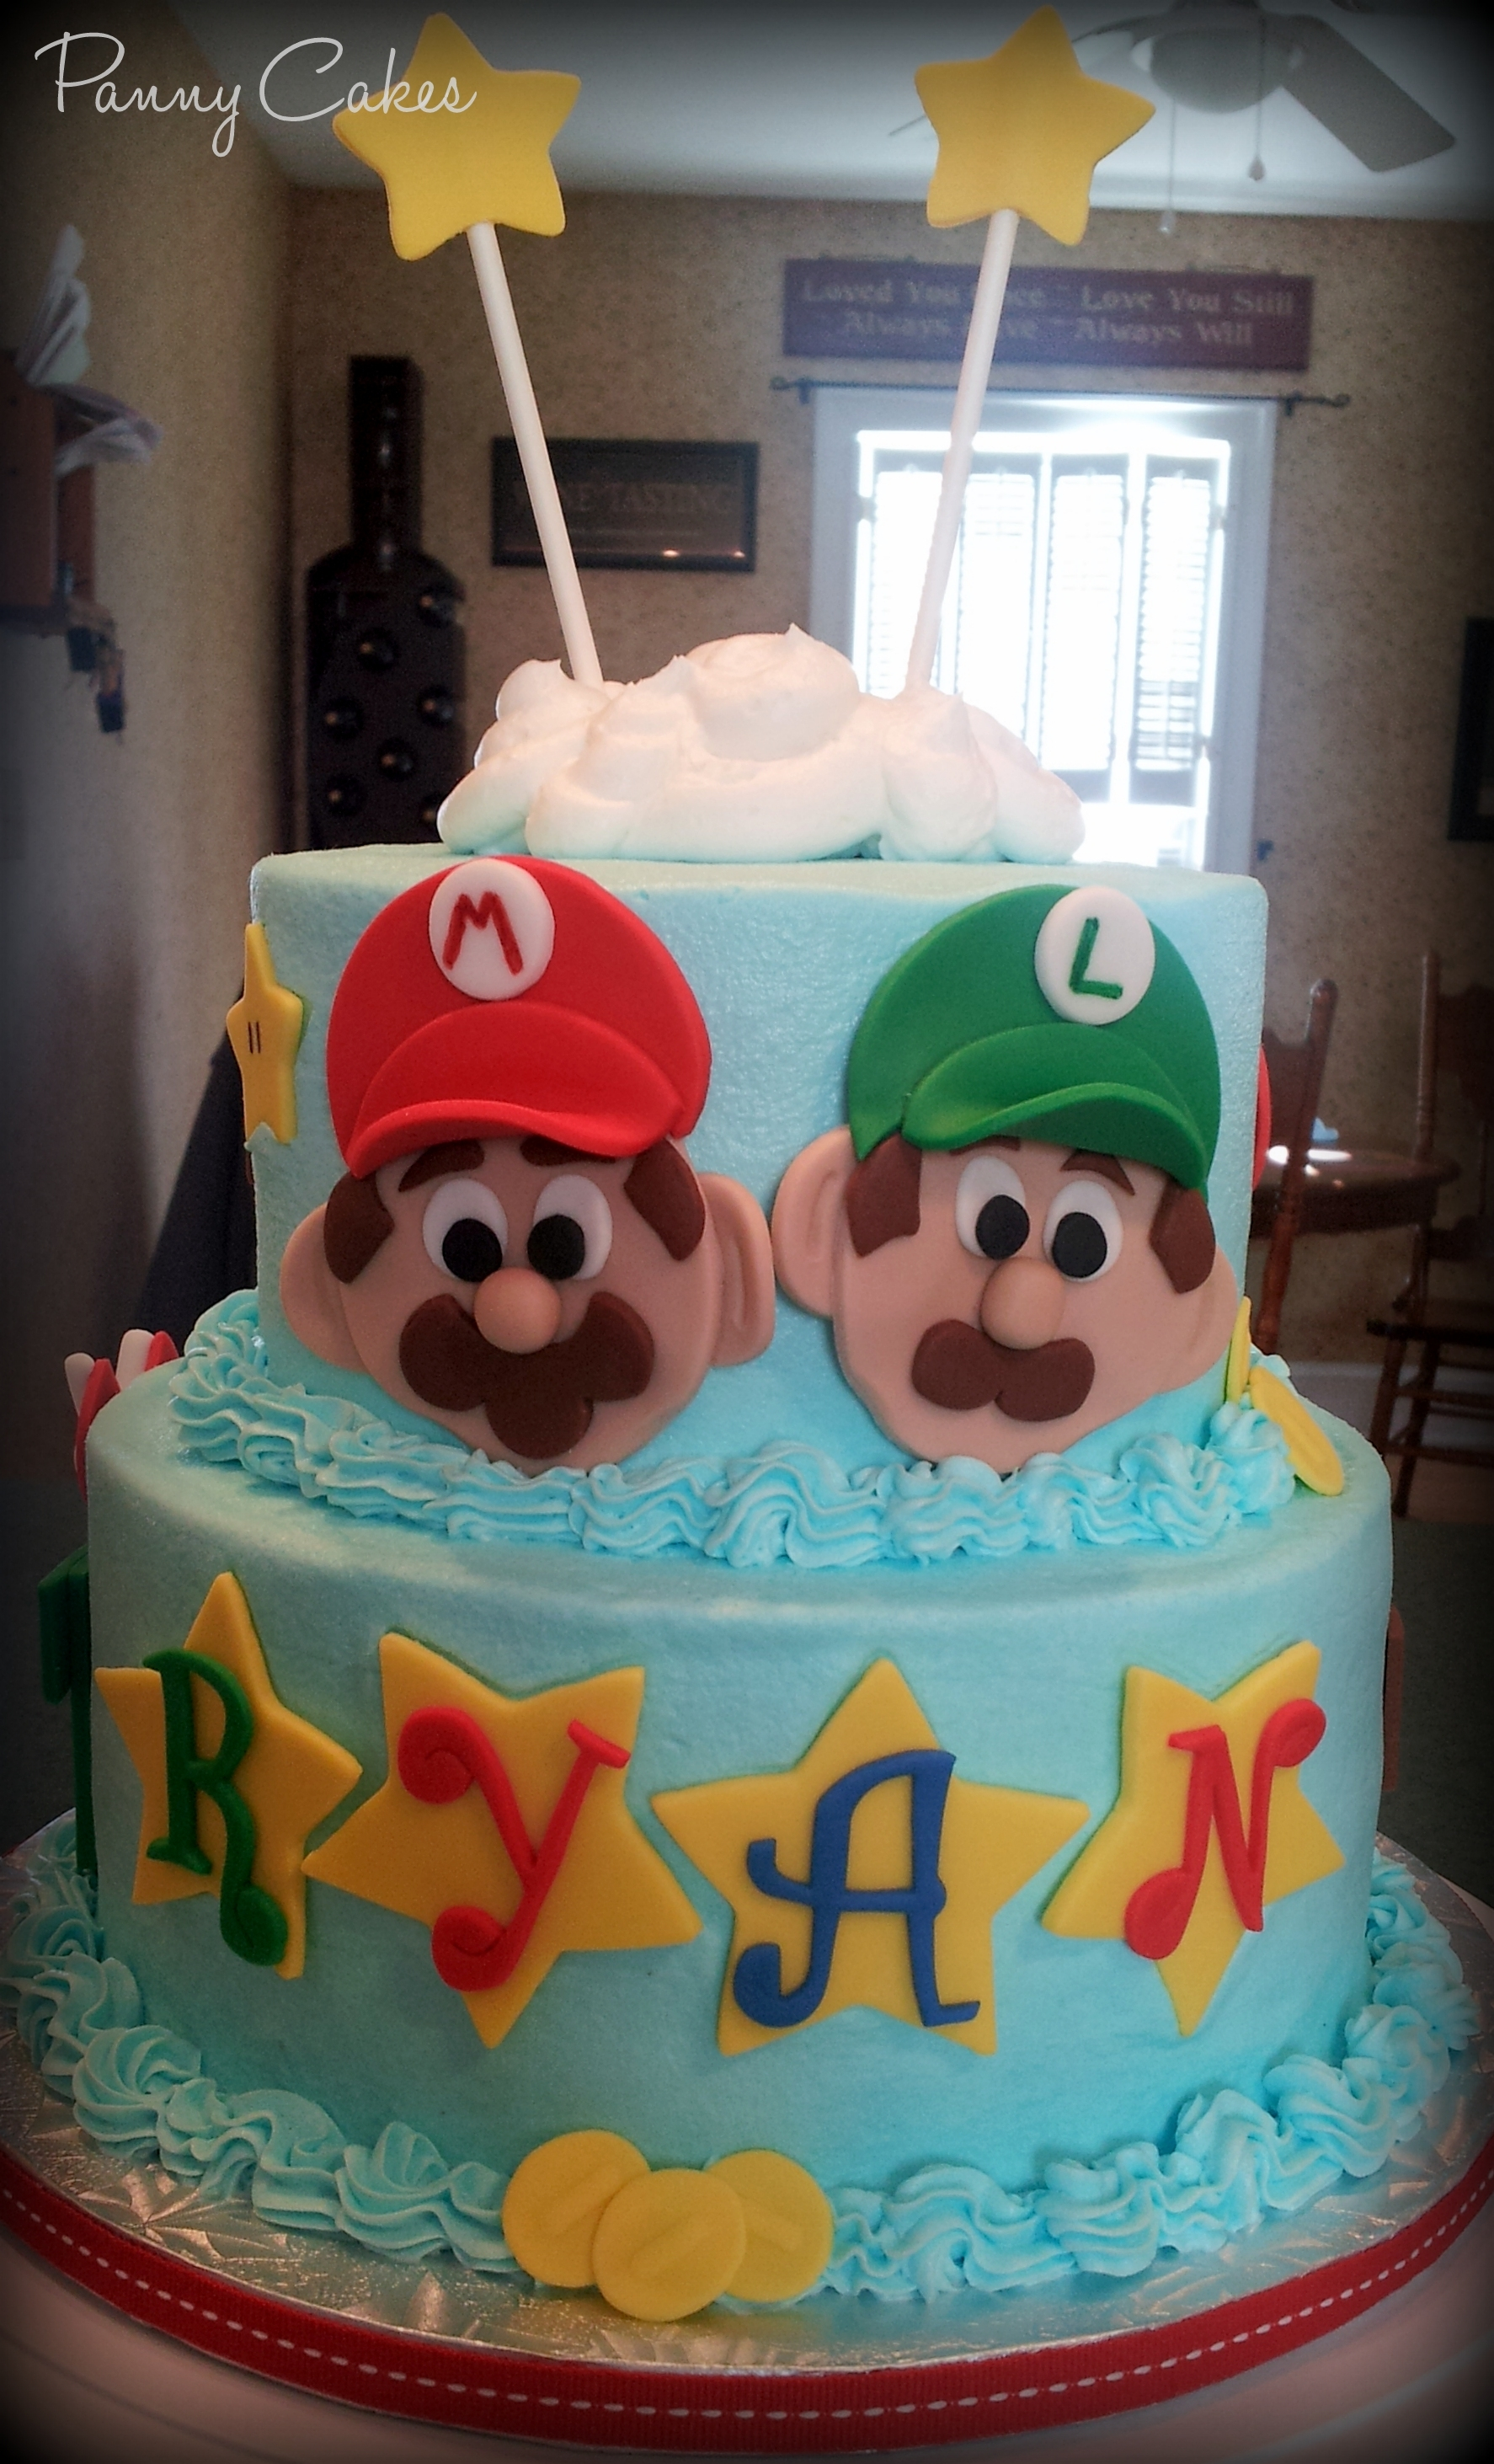 Super Mario Brothers Cake Is Dark Chocolate Fudge With